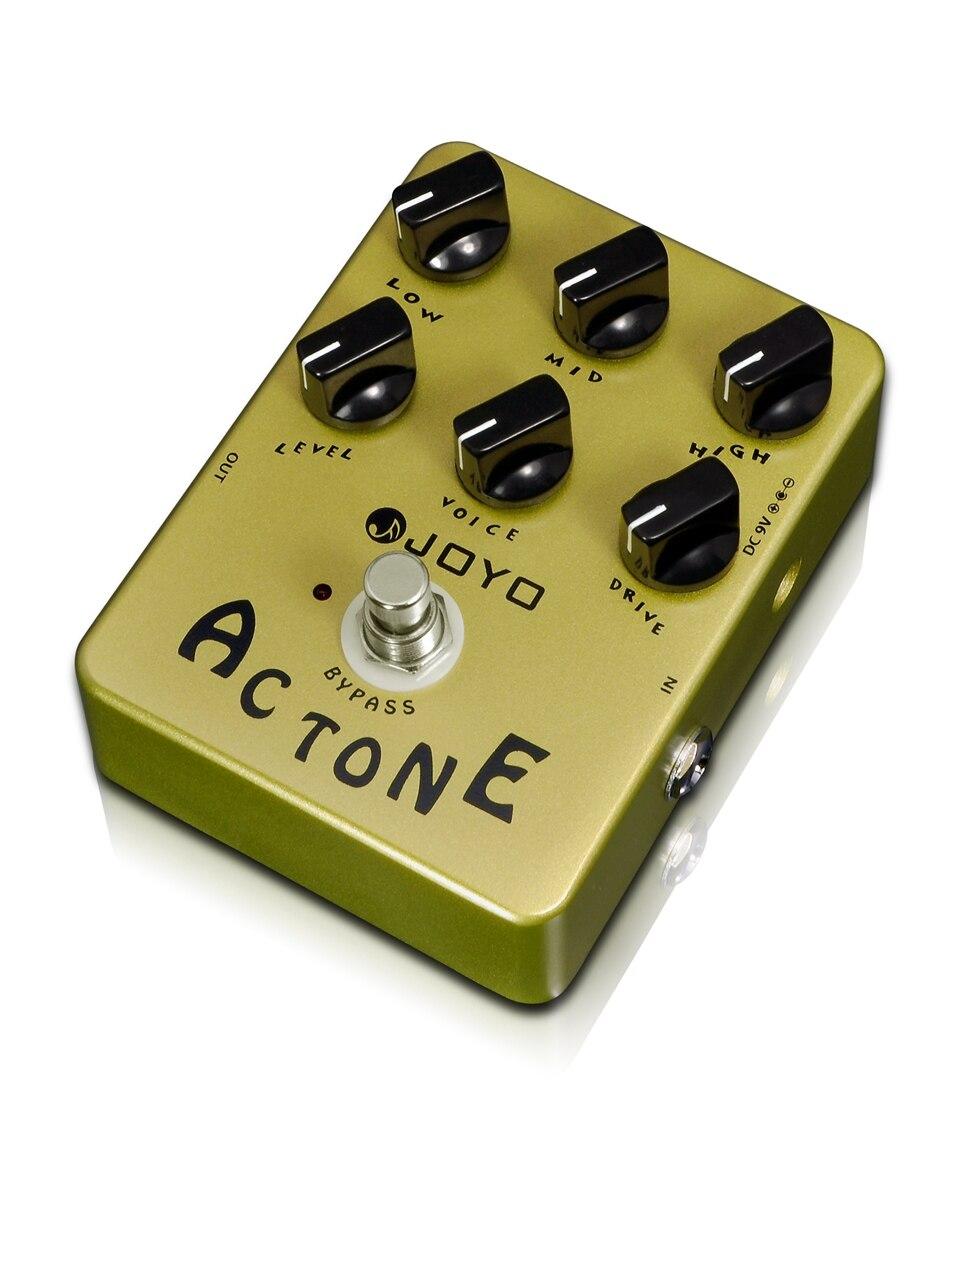 JOYO AC Tone Electric Guitar Effect Pedal Classic British Rock Sound Reproduces The Sound Of A Vox AC30 Amplifier гитарный усилитель vox amplug 2 classic rock